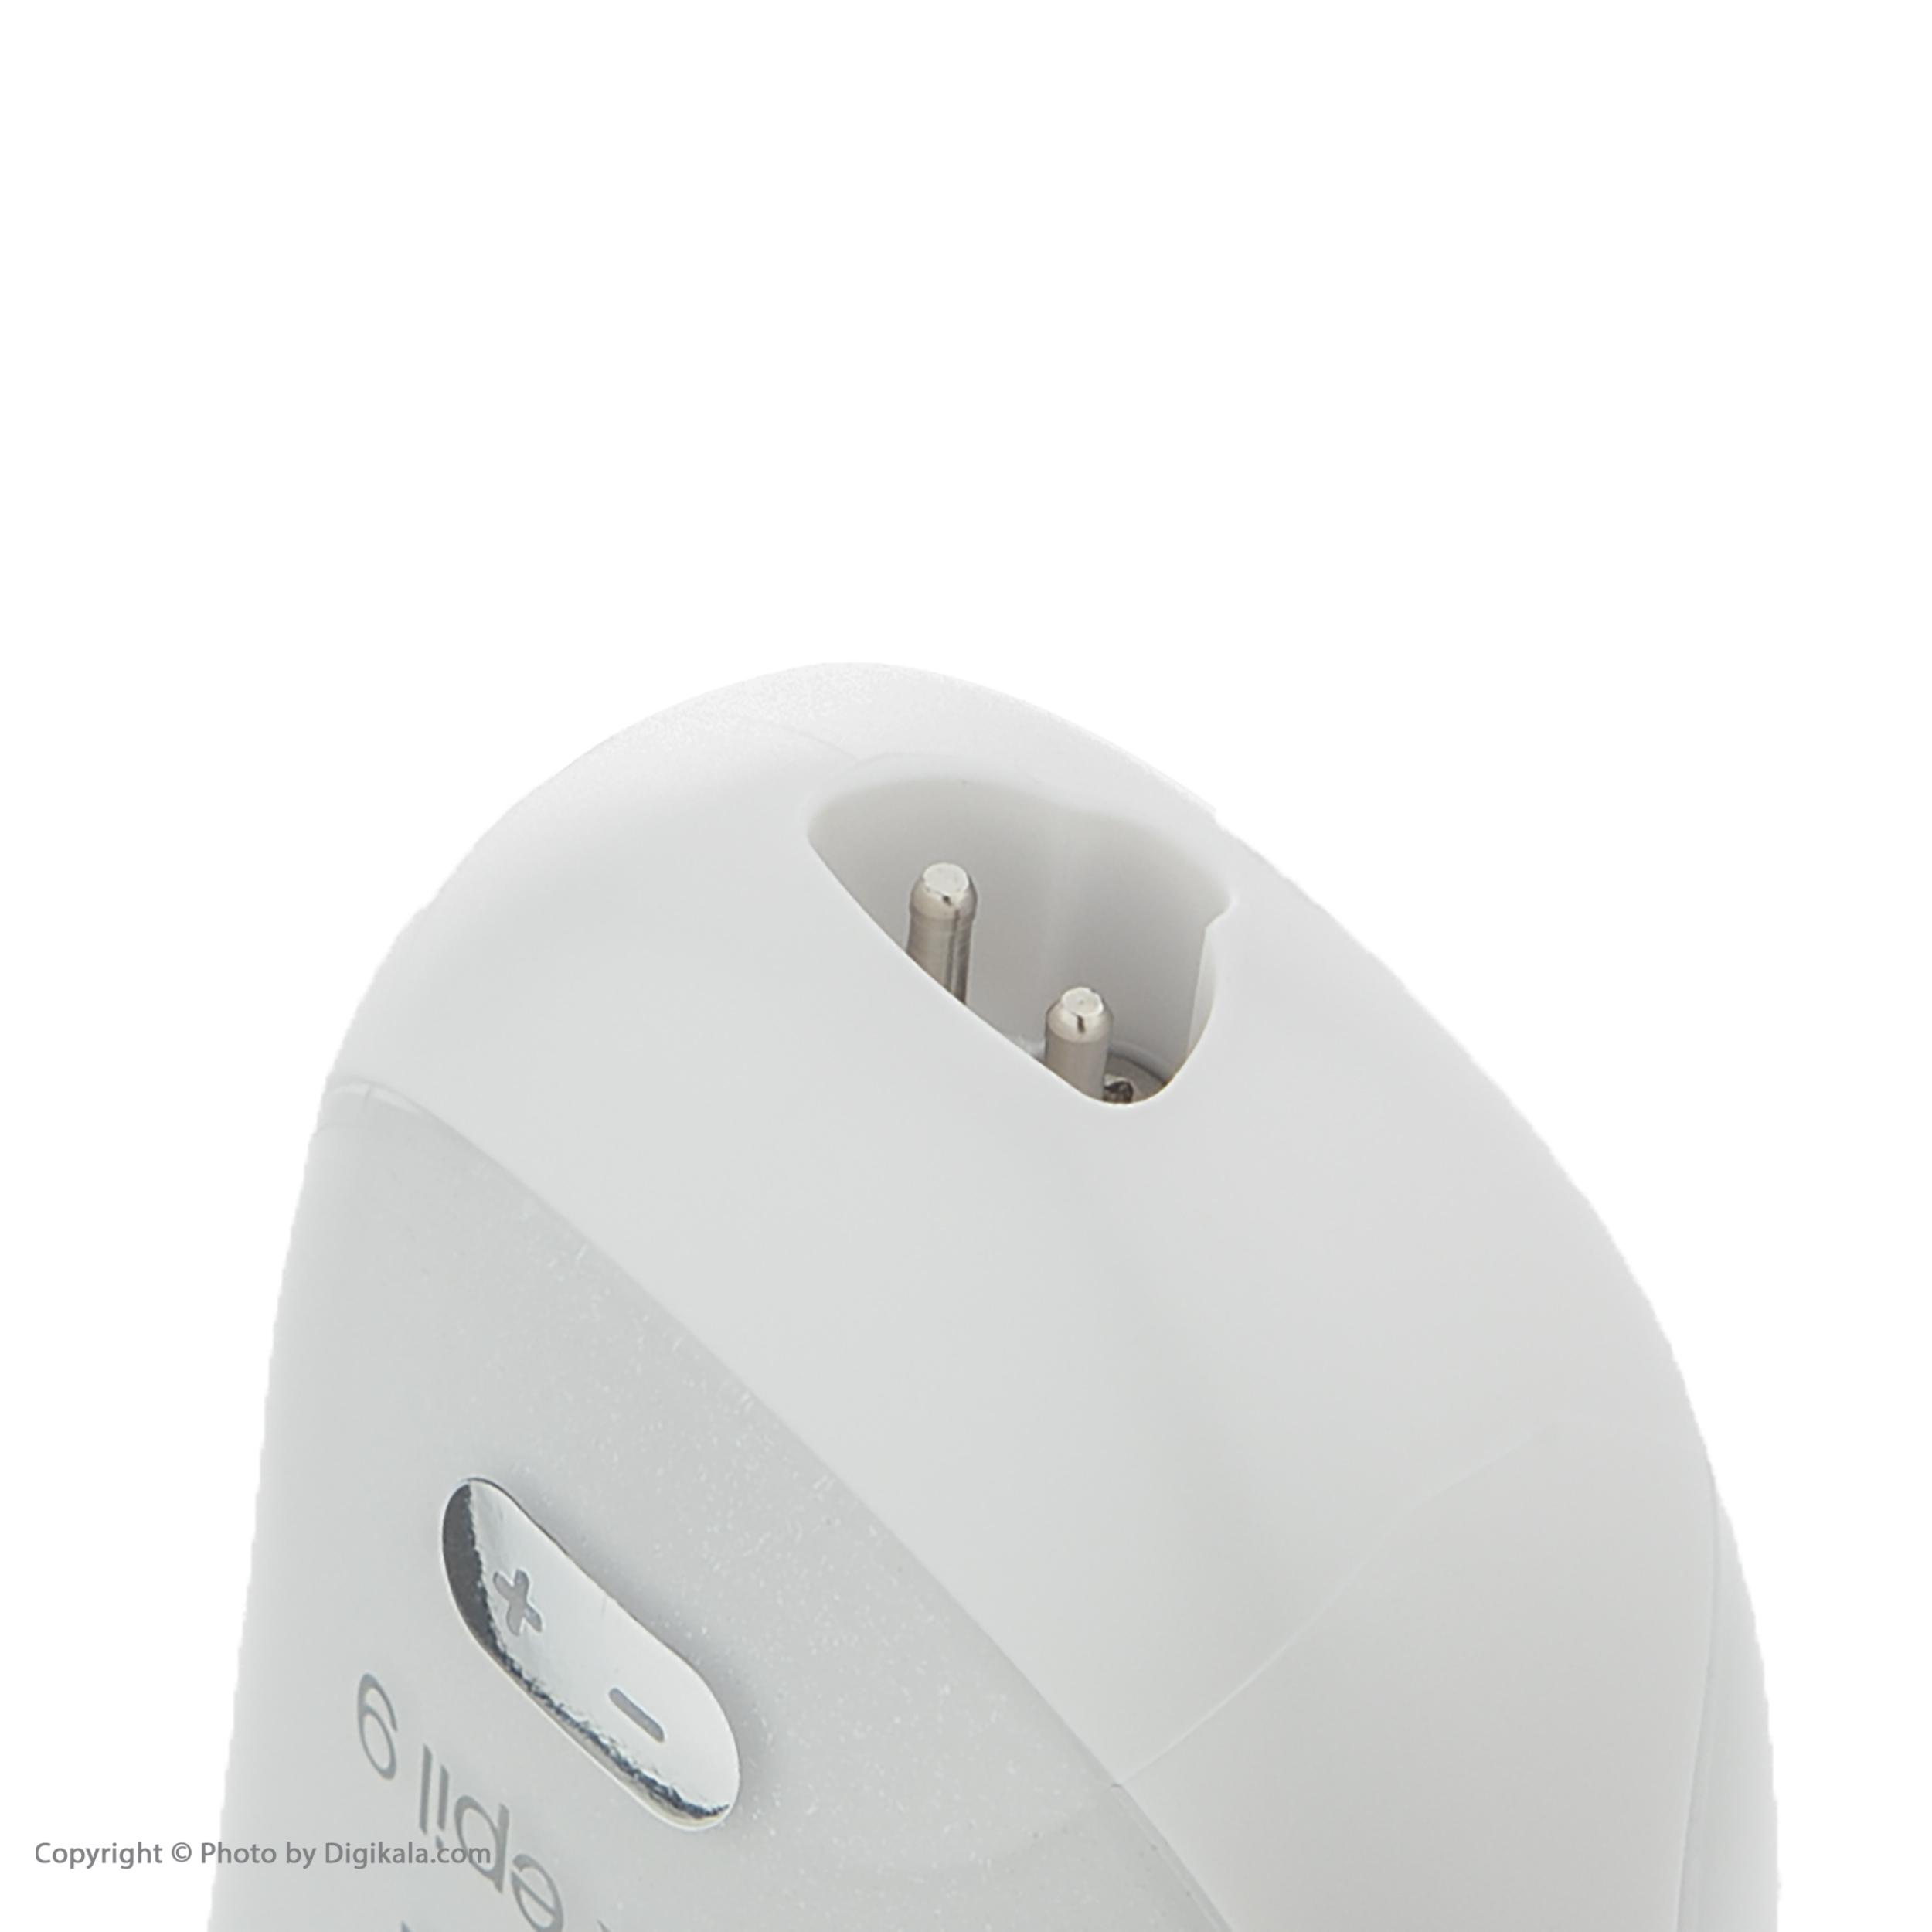 اپیلاتور و برس پاکسازی براون مدل Face Epil-Spa -  - 9